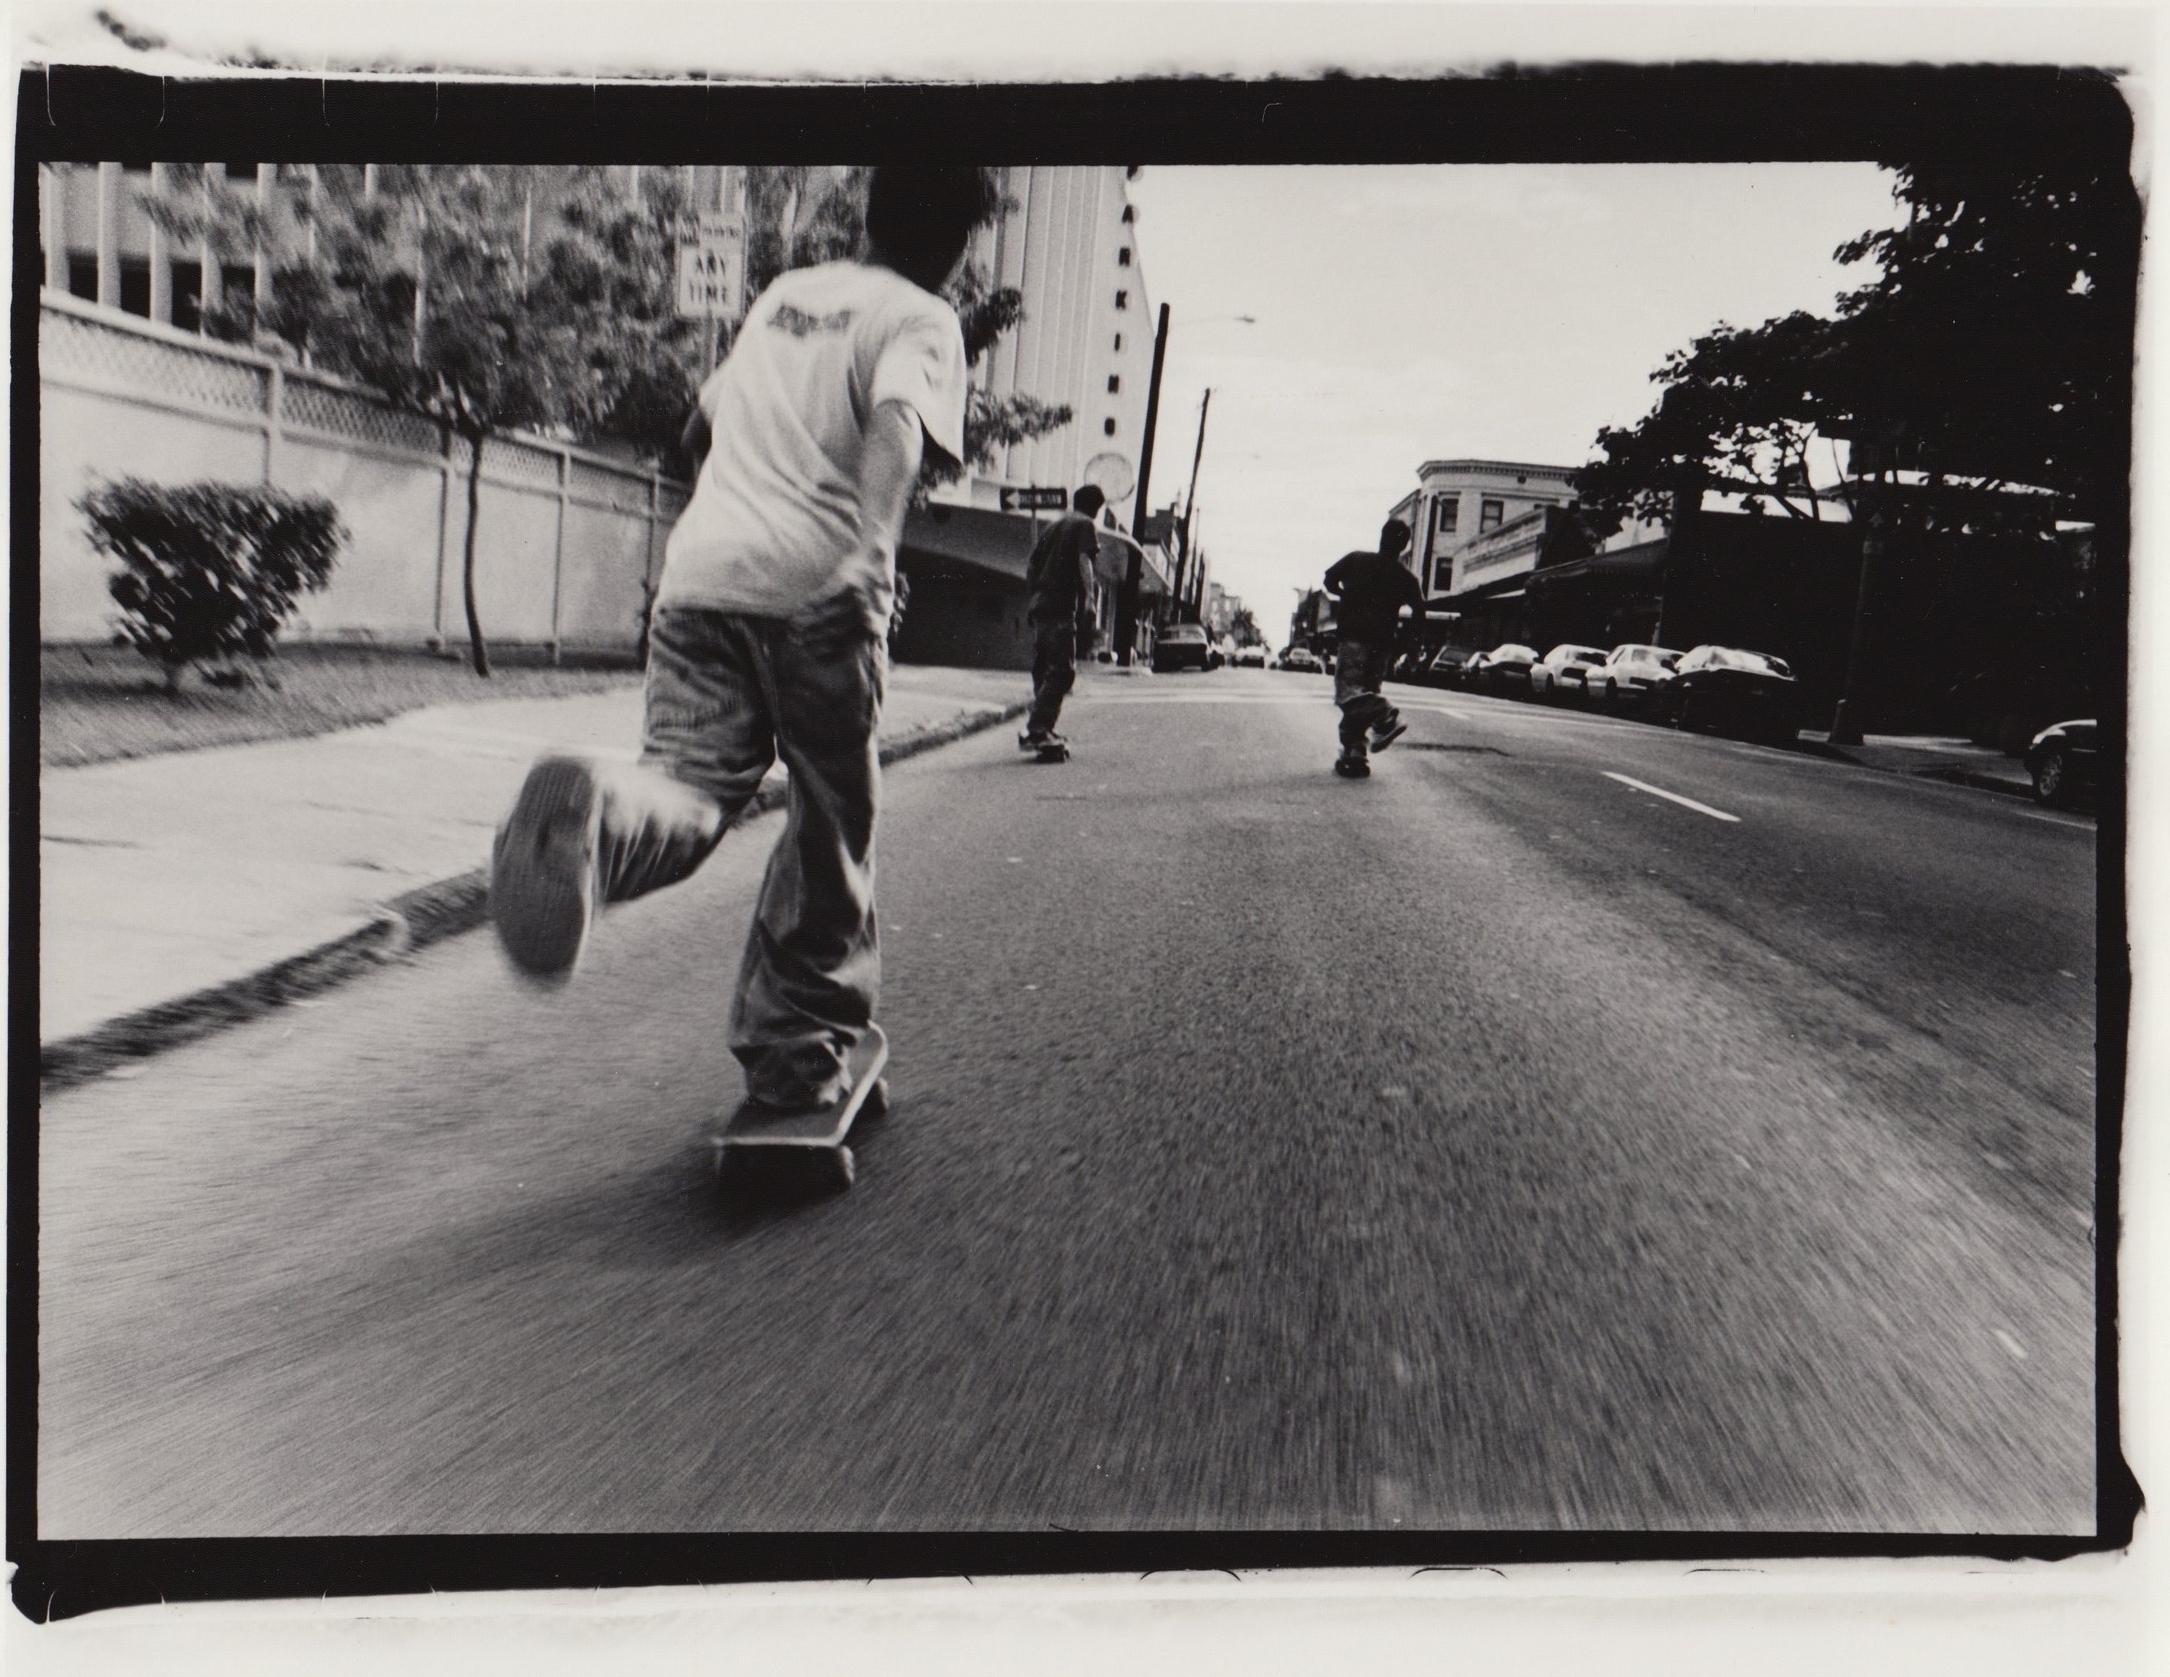 HNL - A very brief history of skateboarding in Honolulu.